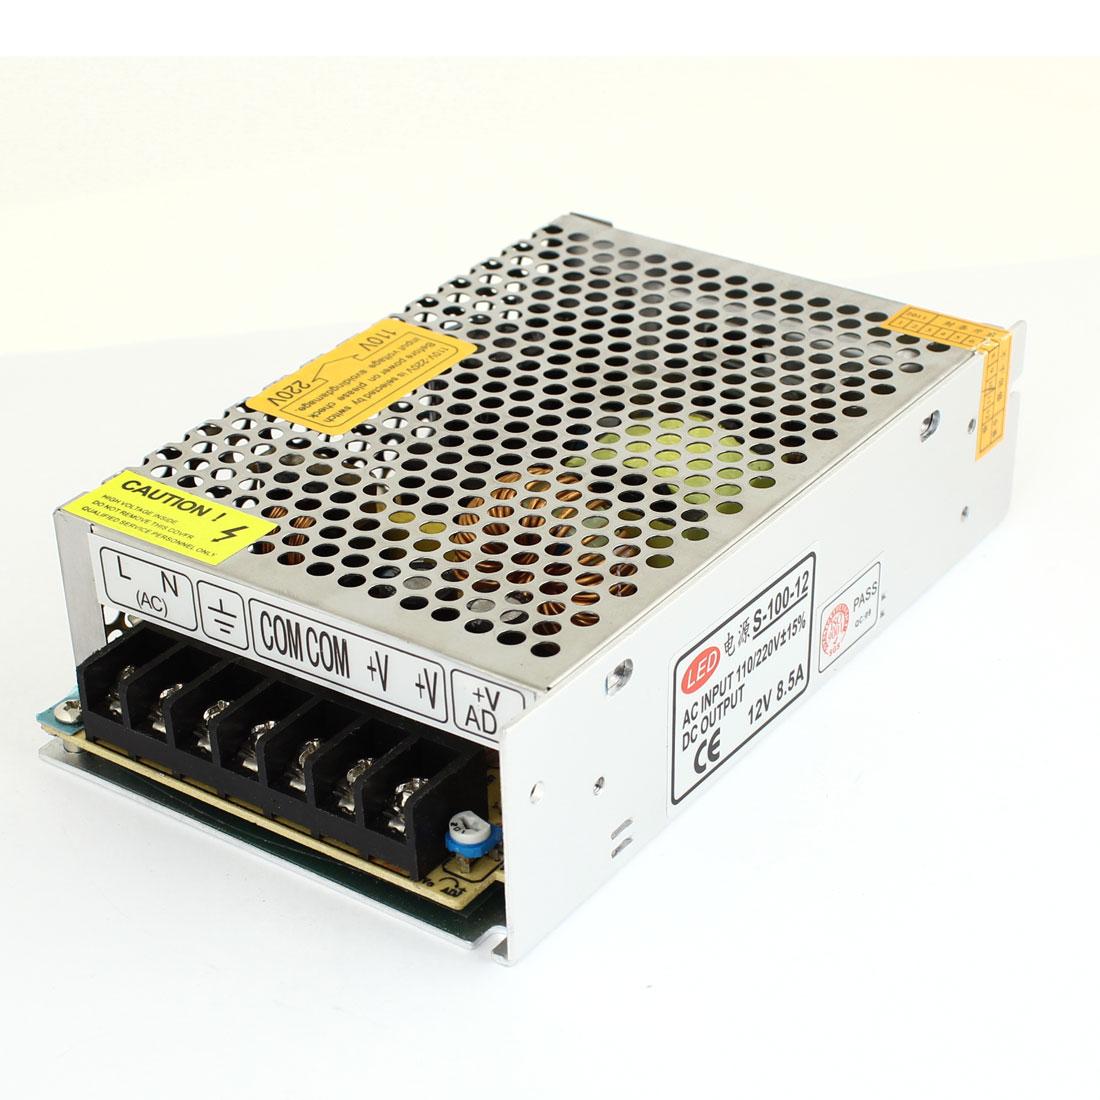 AC 110/220V DC 12V 8.5A 100W Switch Power Supply Driver for LED Light Strip